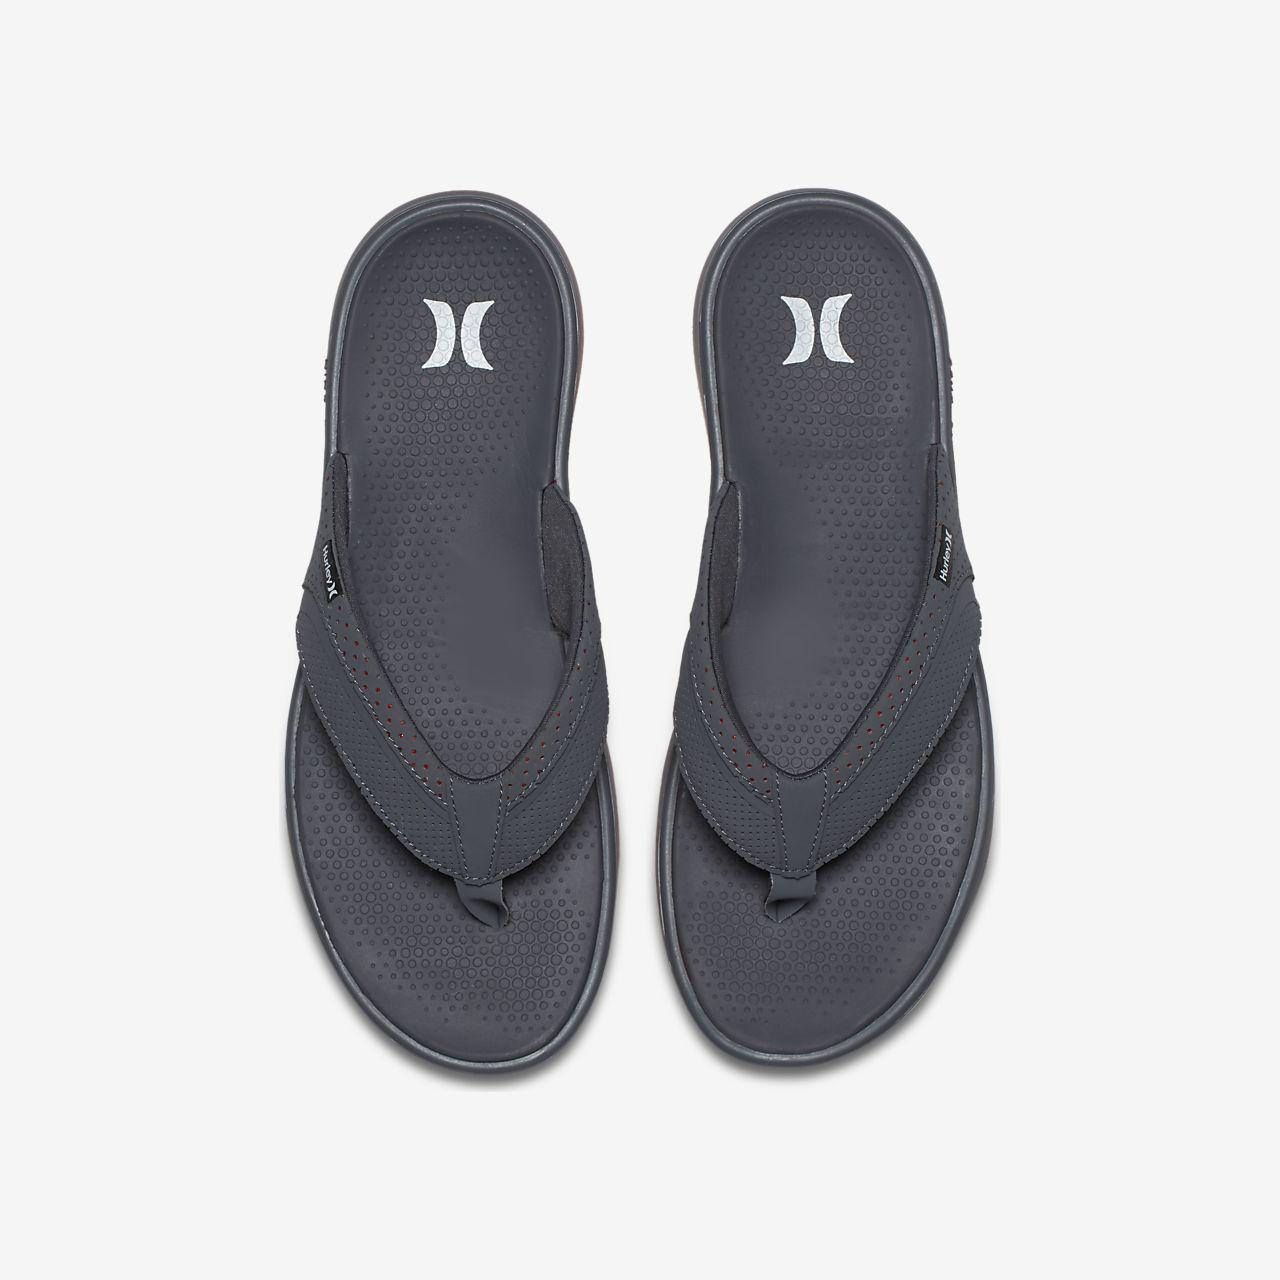 b42f66be1 Hurley Phantom Free Motion Men s Sandal. Nike.com HR